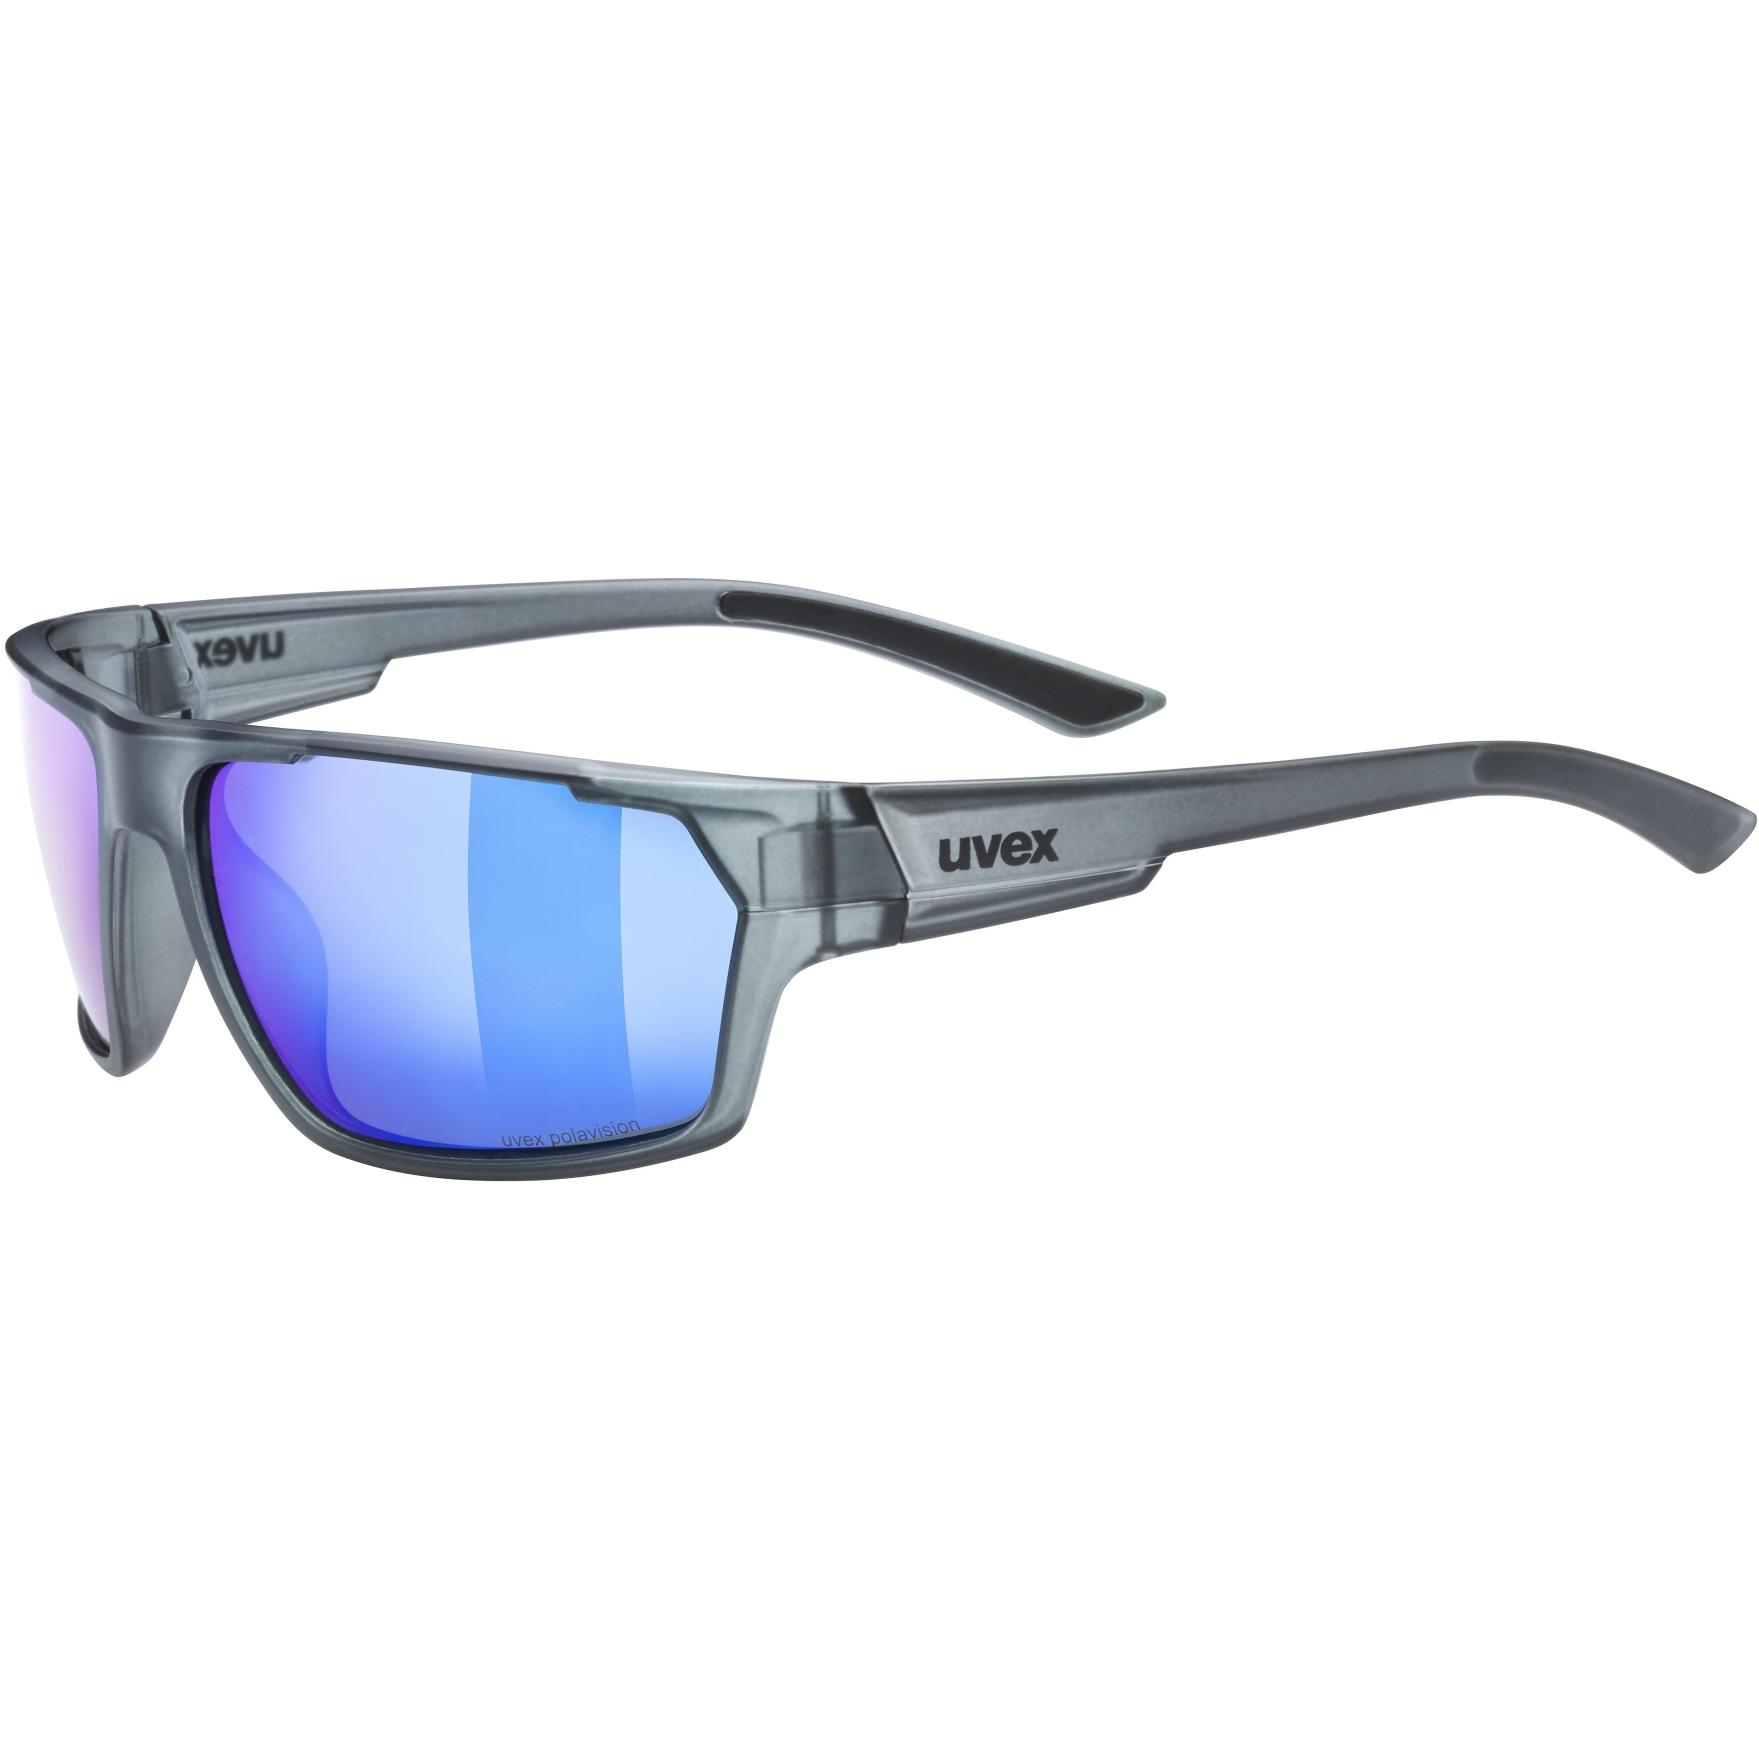 Uvex sportstyle 233 P Glasses - smoke mat/polavision mirror blue